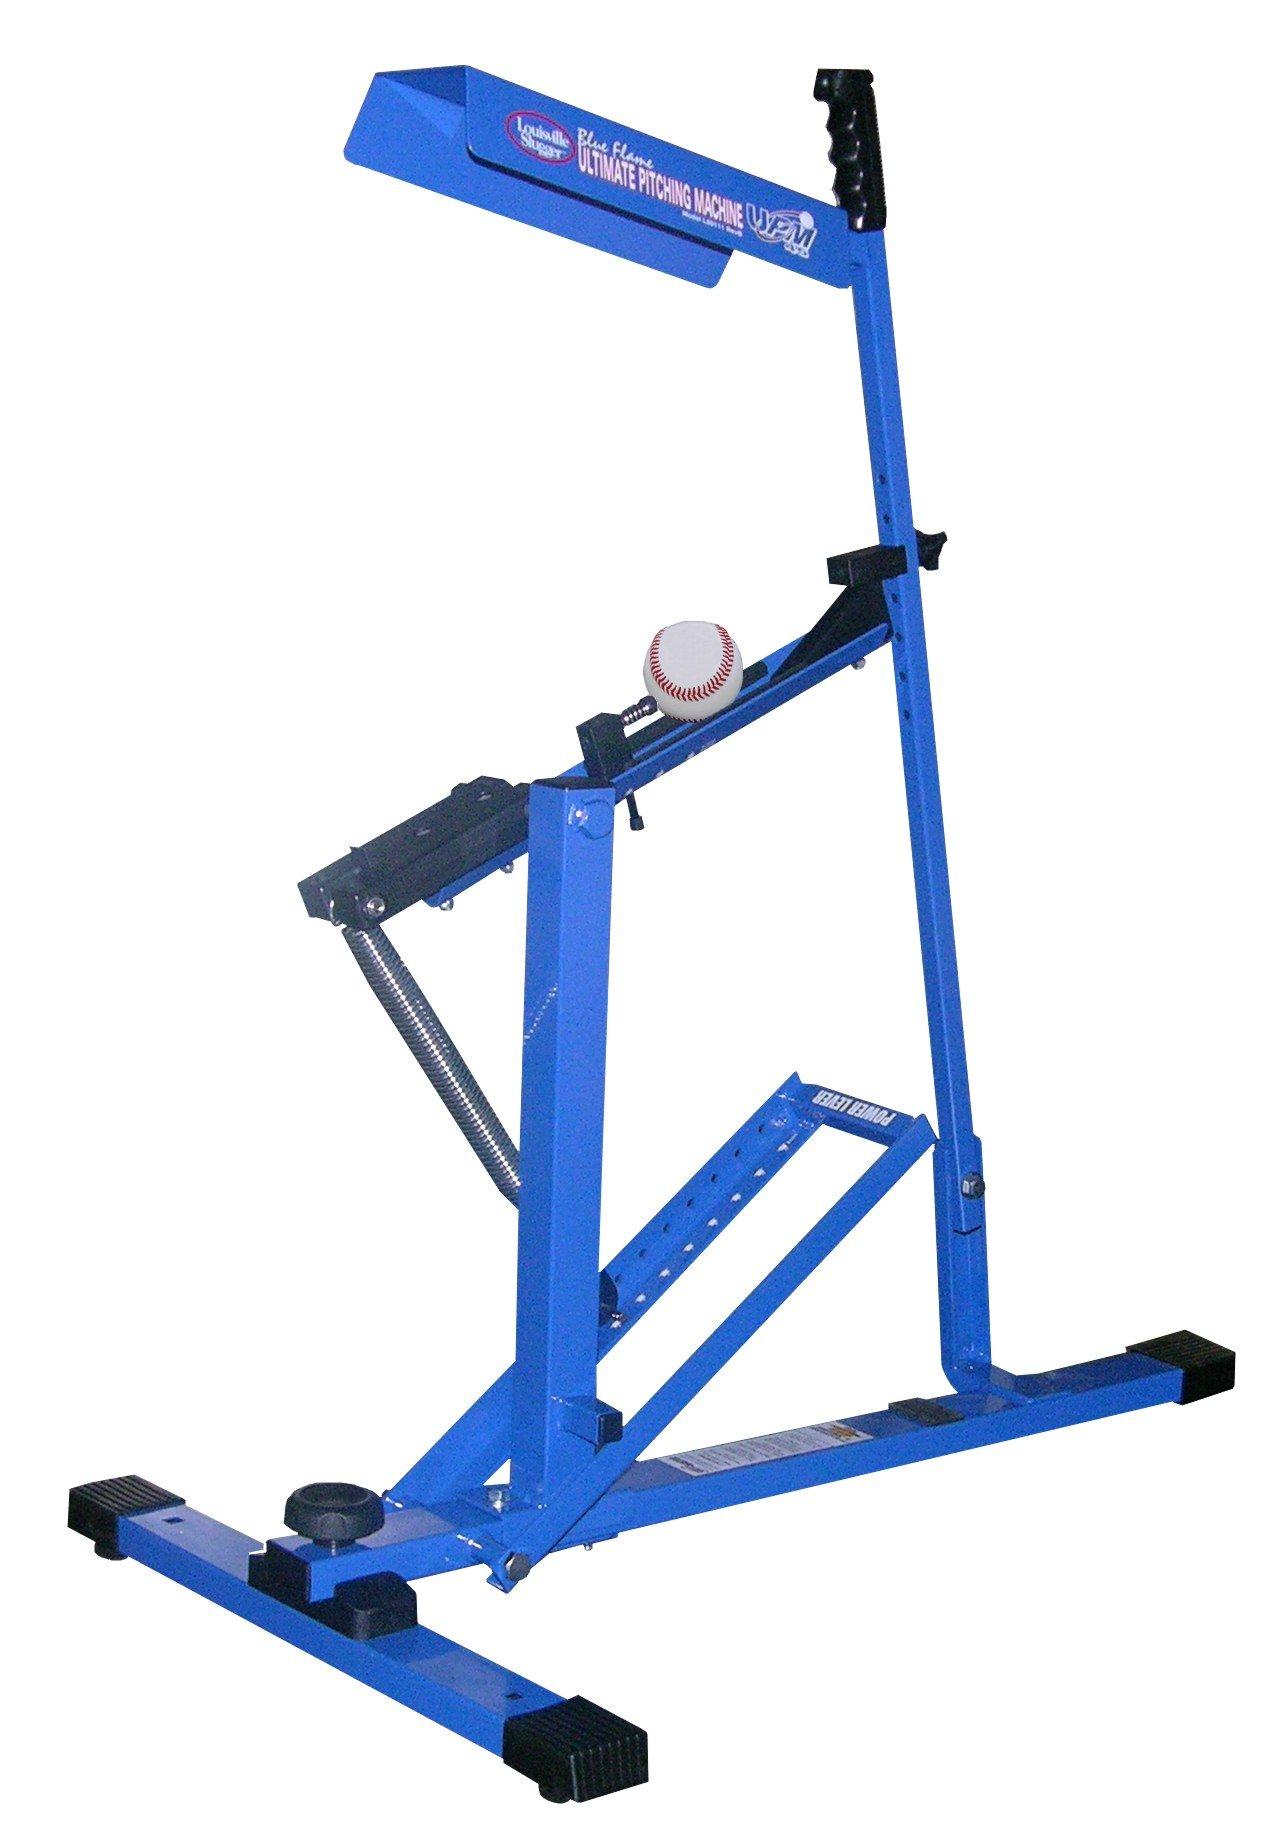 Louisville Slugger UPM 45 Blue Flame Pitching Machine by Louisville Slugger